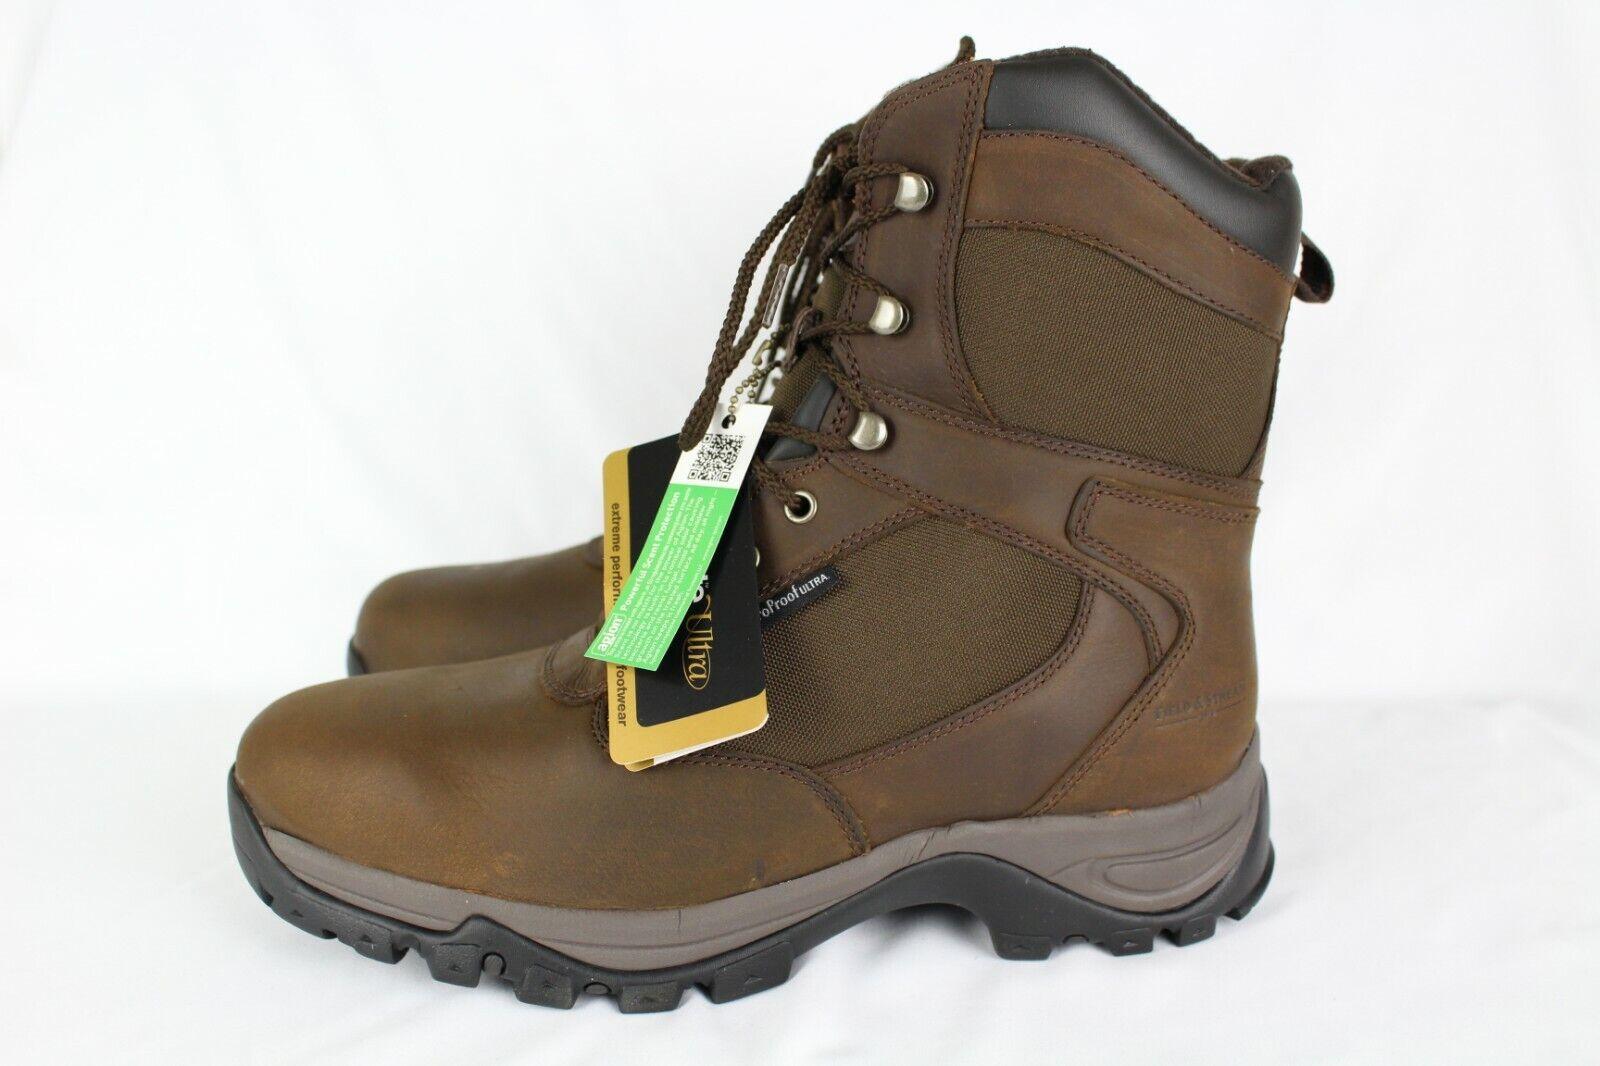 New Field & Stream Men's Woodsman 800 Gram Hunting Boots Size 12m Dark Brown